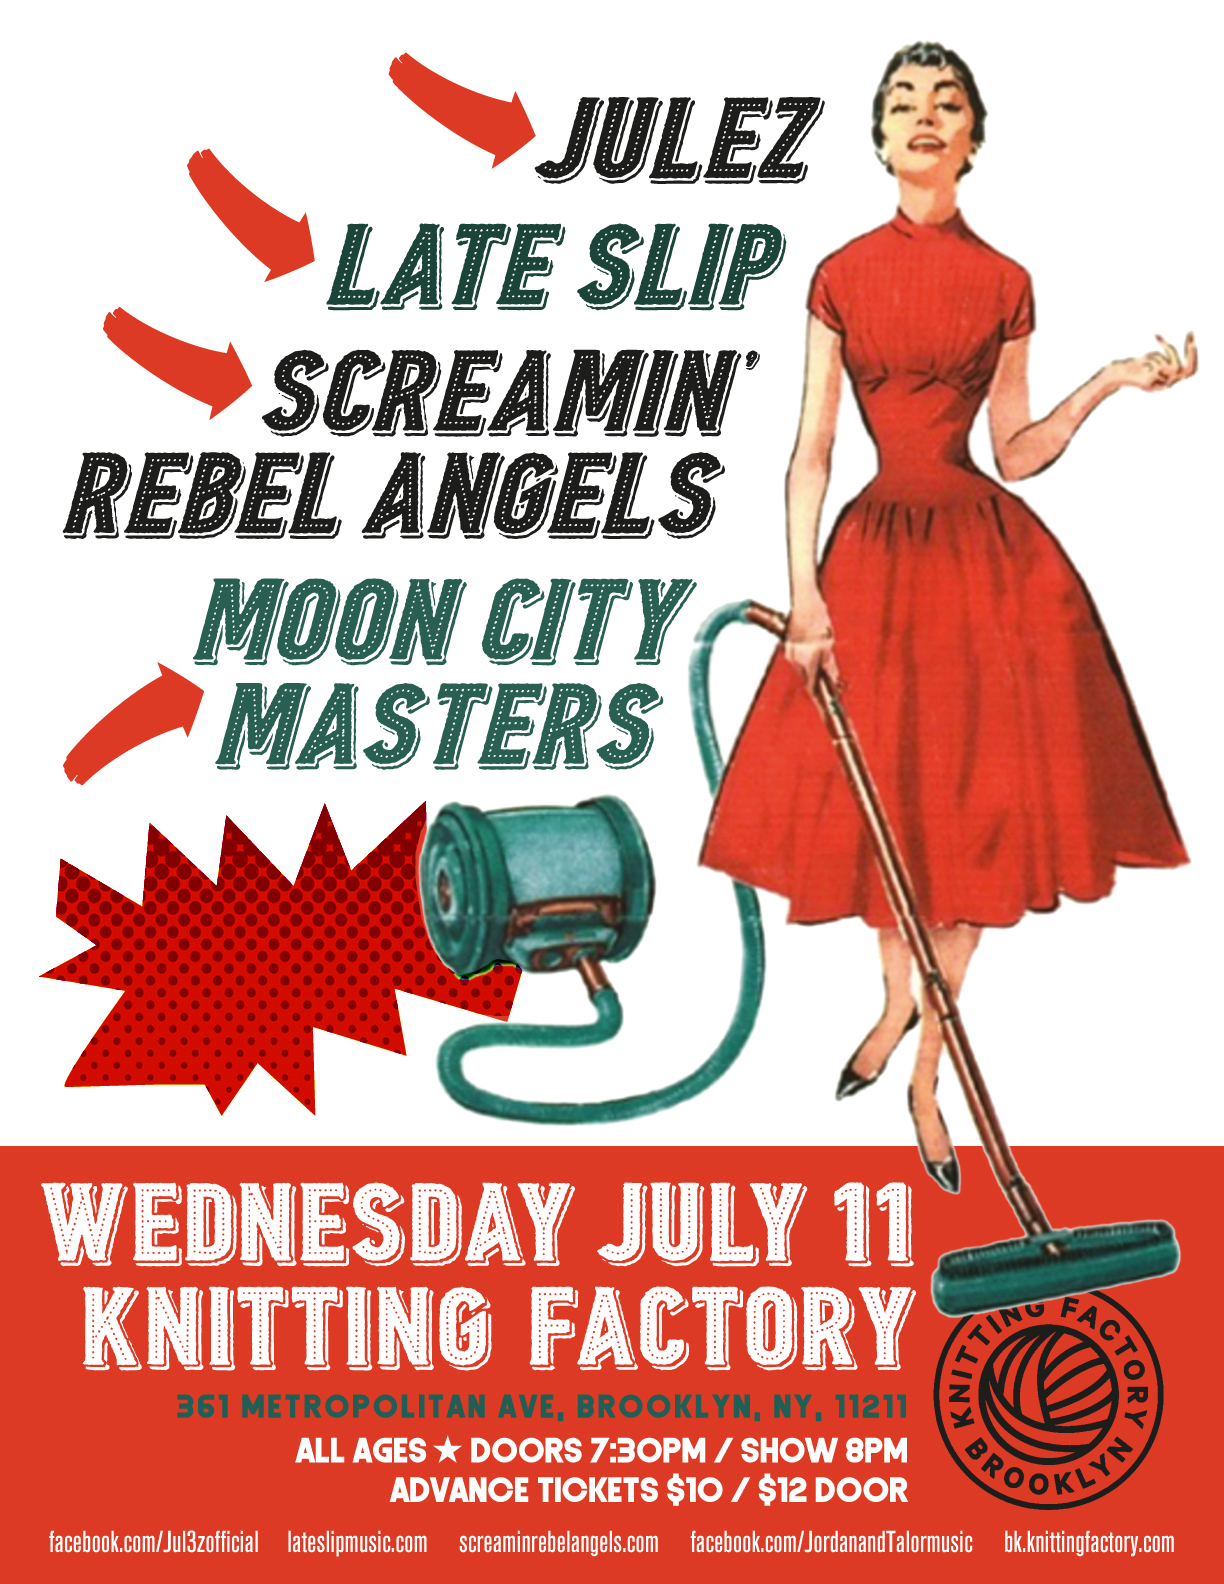 Knitting Factory July 7 Poster.jpg